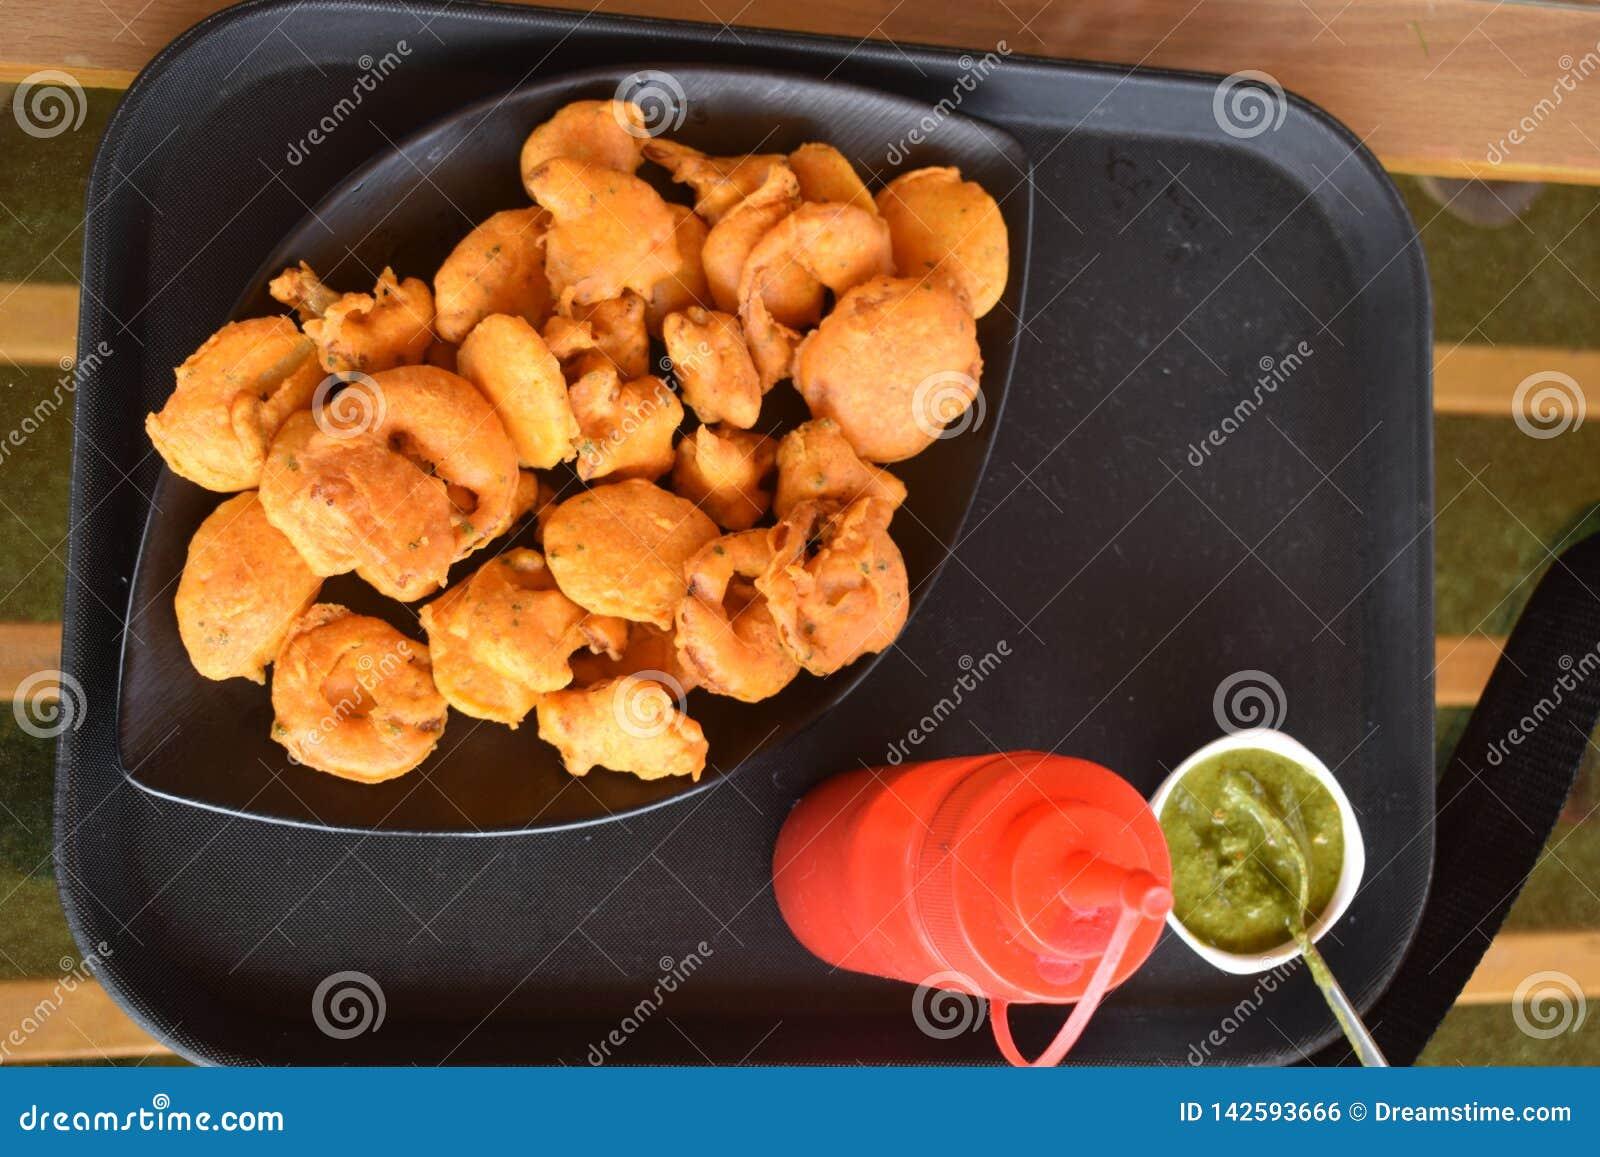 Indian Pakoda fried snack fritter